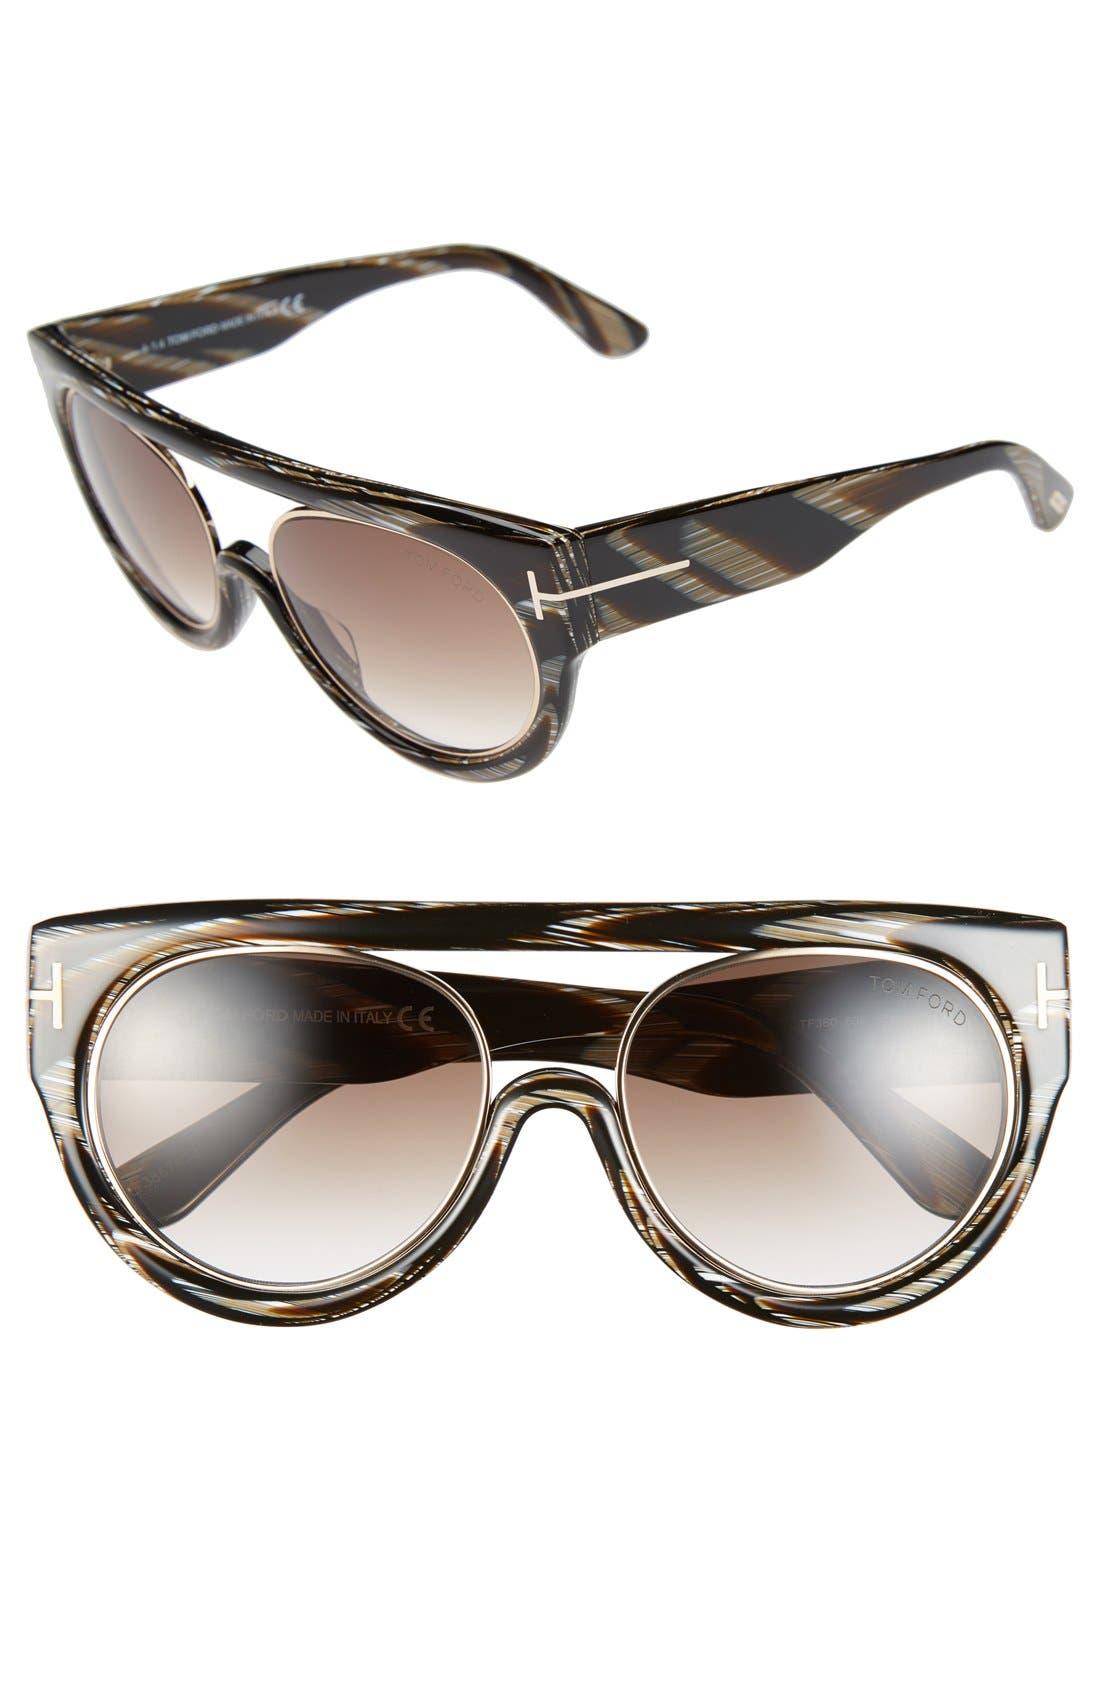 Alternate Image 1 Selected - Tom Ford 'Alana' 55mm Modified Aviator Sunglasses